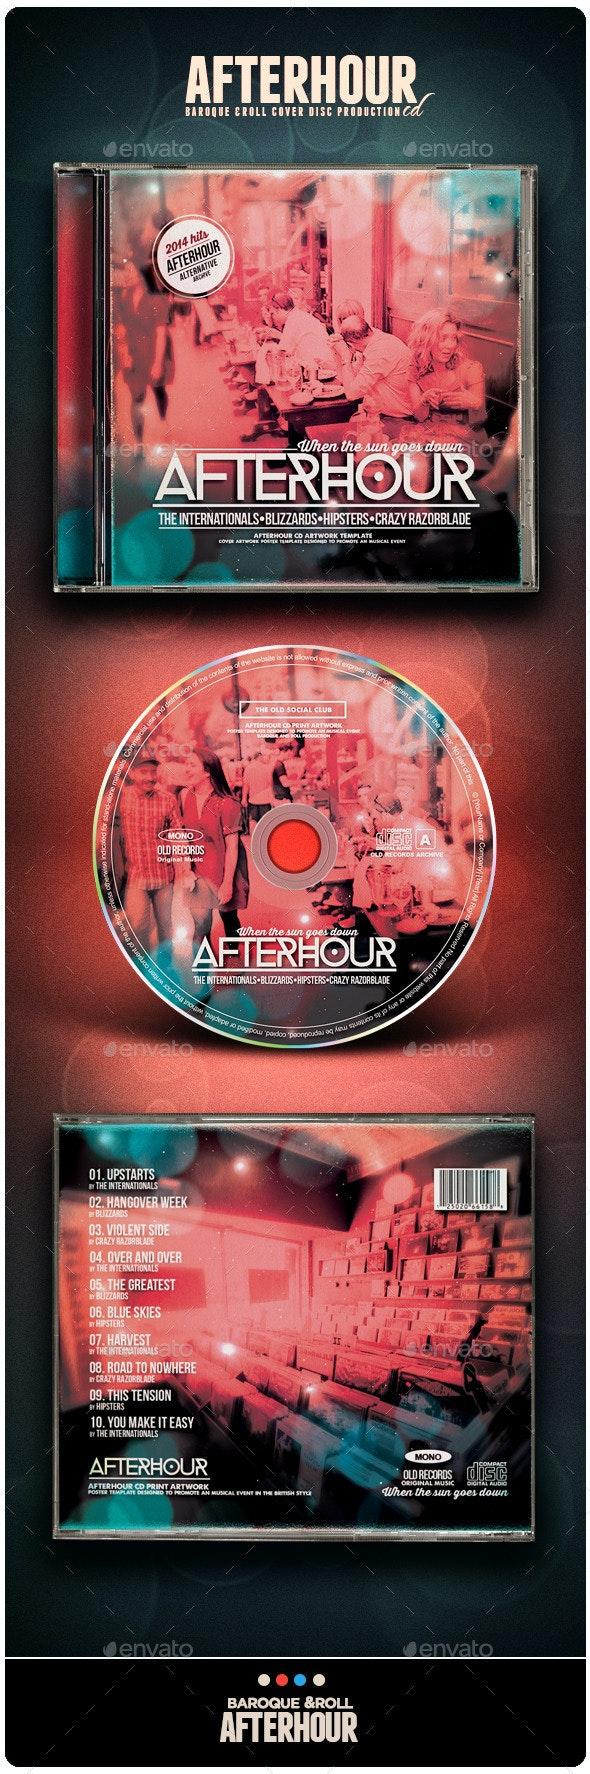 Afterhour CD  - CD & DVD Artwork Print Templates